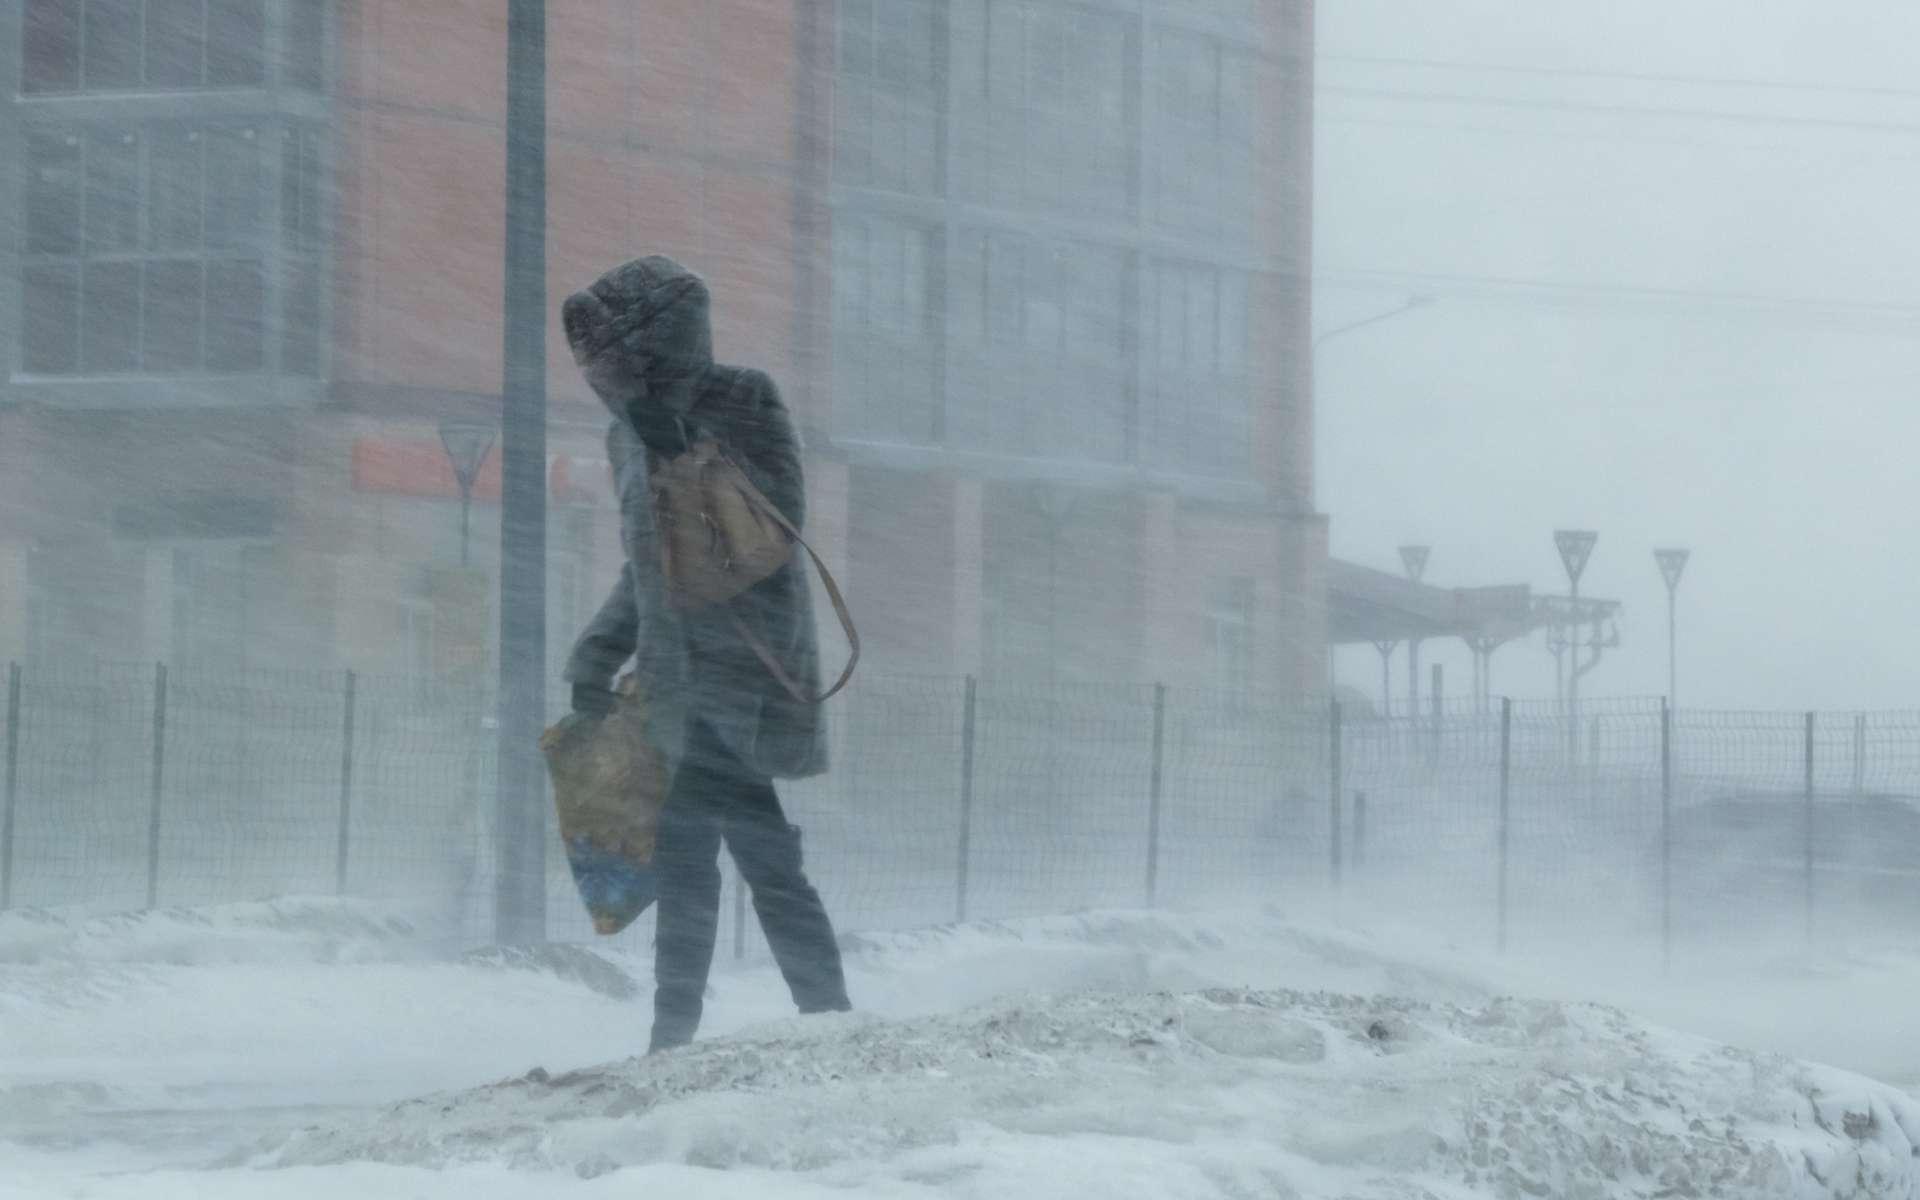 Le blizzard renforce l'impression de froid. © justoomm, Adobe Stock